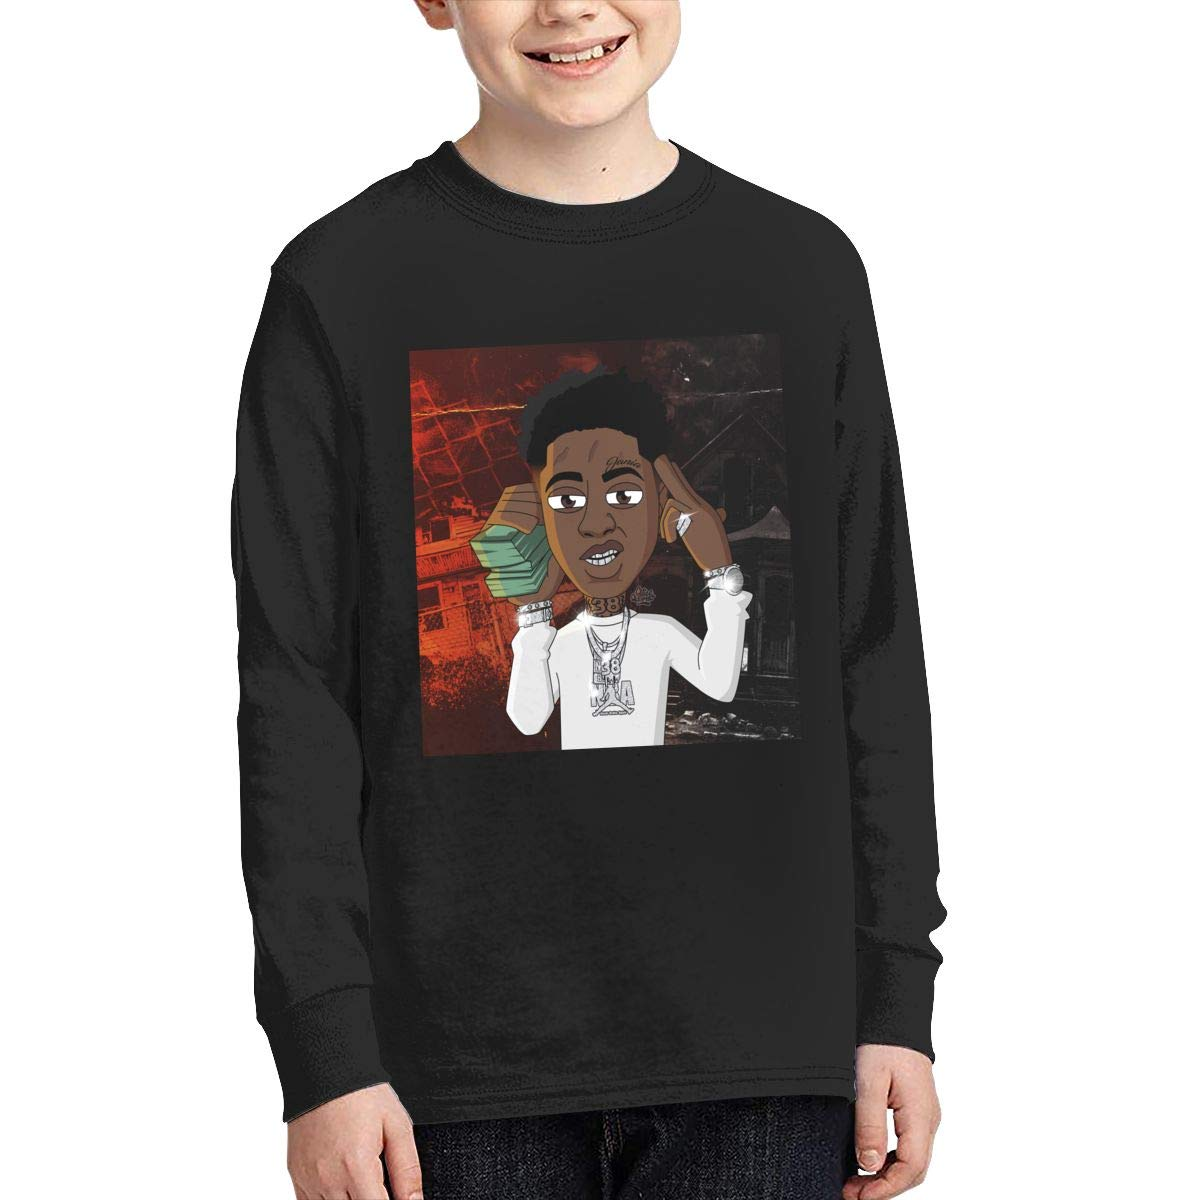 Optumus Youngboy Cartoon Kids Sweatshirts Long Sleeve T Shirt Boy Girl Children Teenagers Unisex Tee